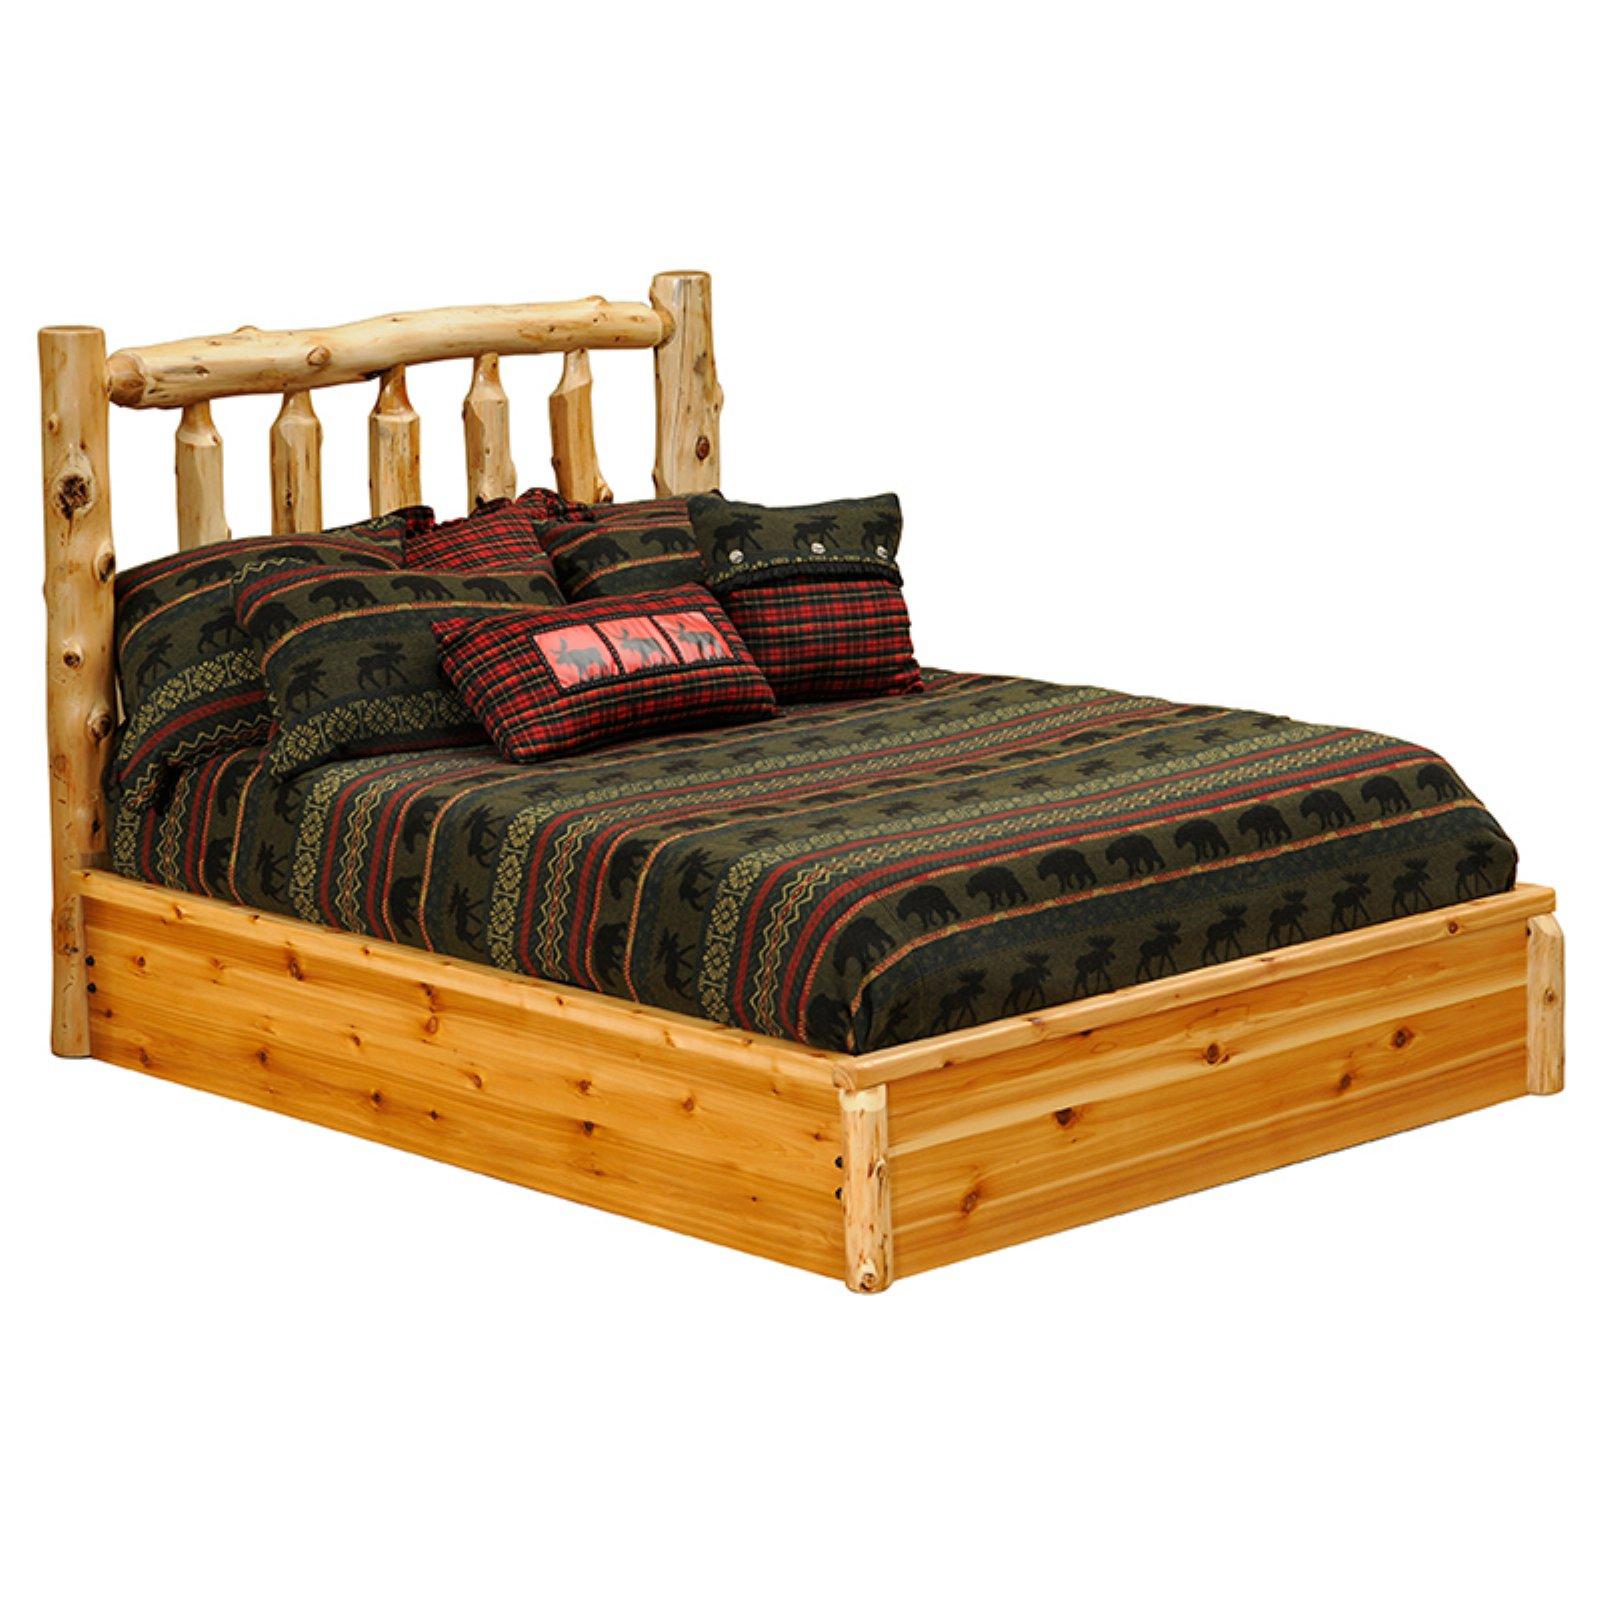 Fireside Lodge Cedar Platform Bed, Size California King